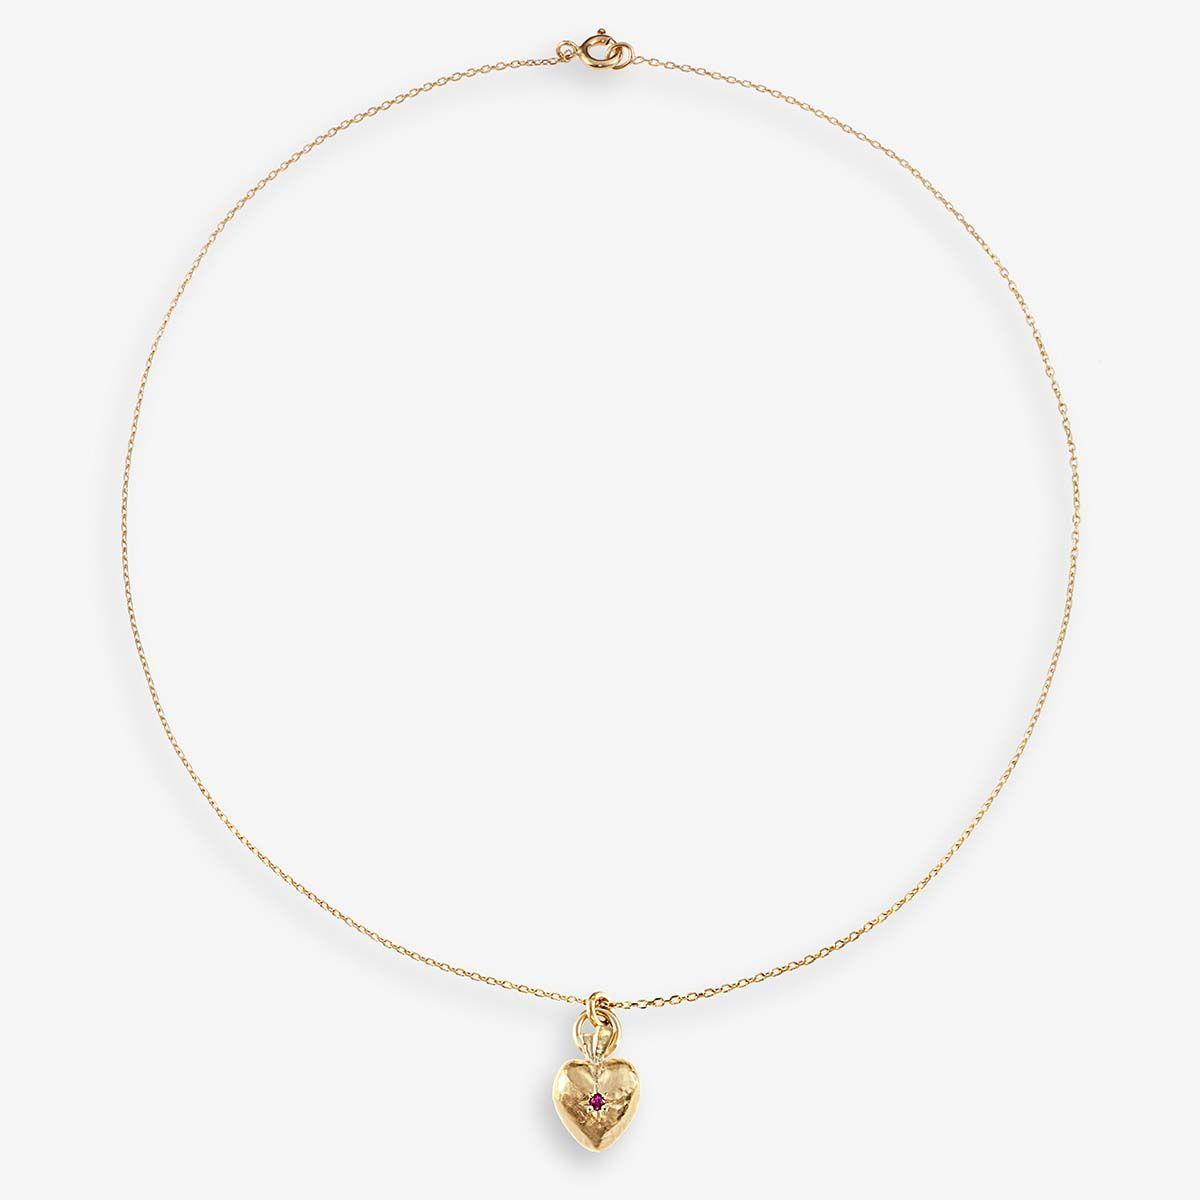 Valentin Ruby - Halsketten - 24k vergoldet